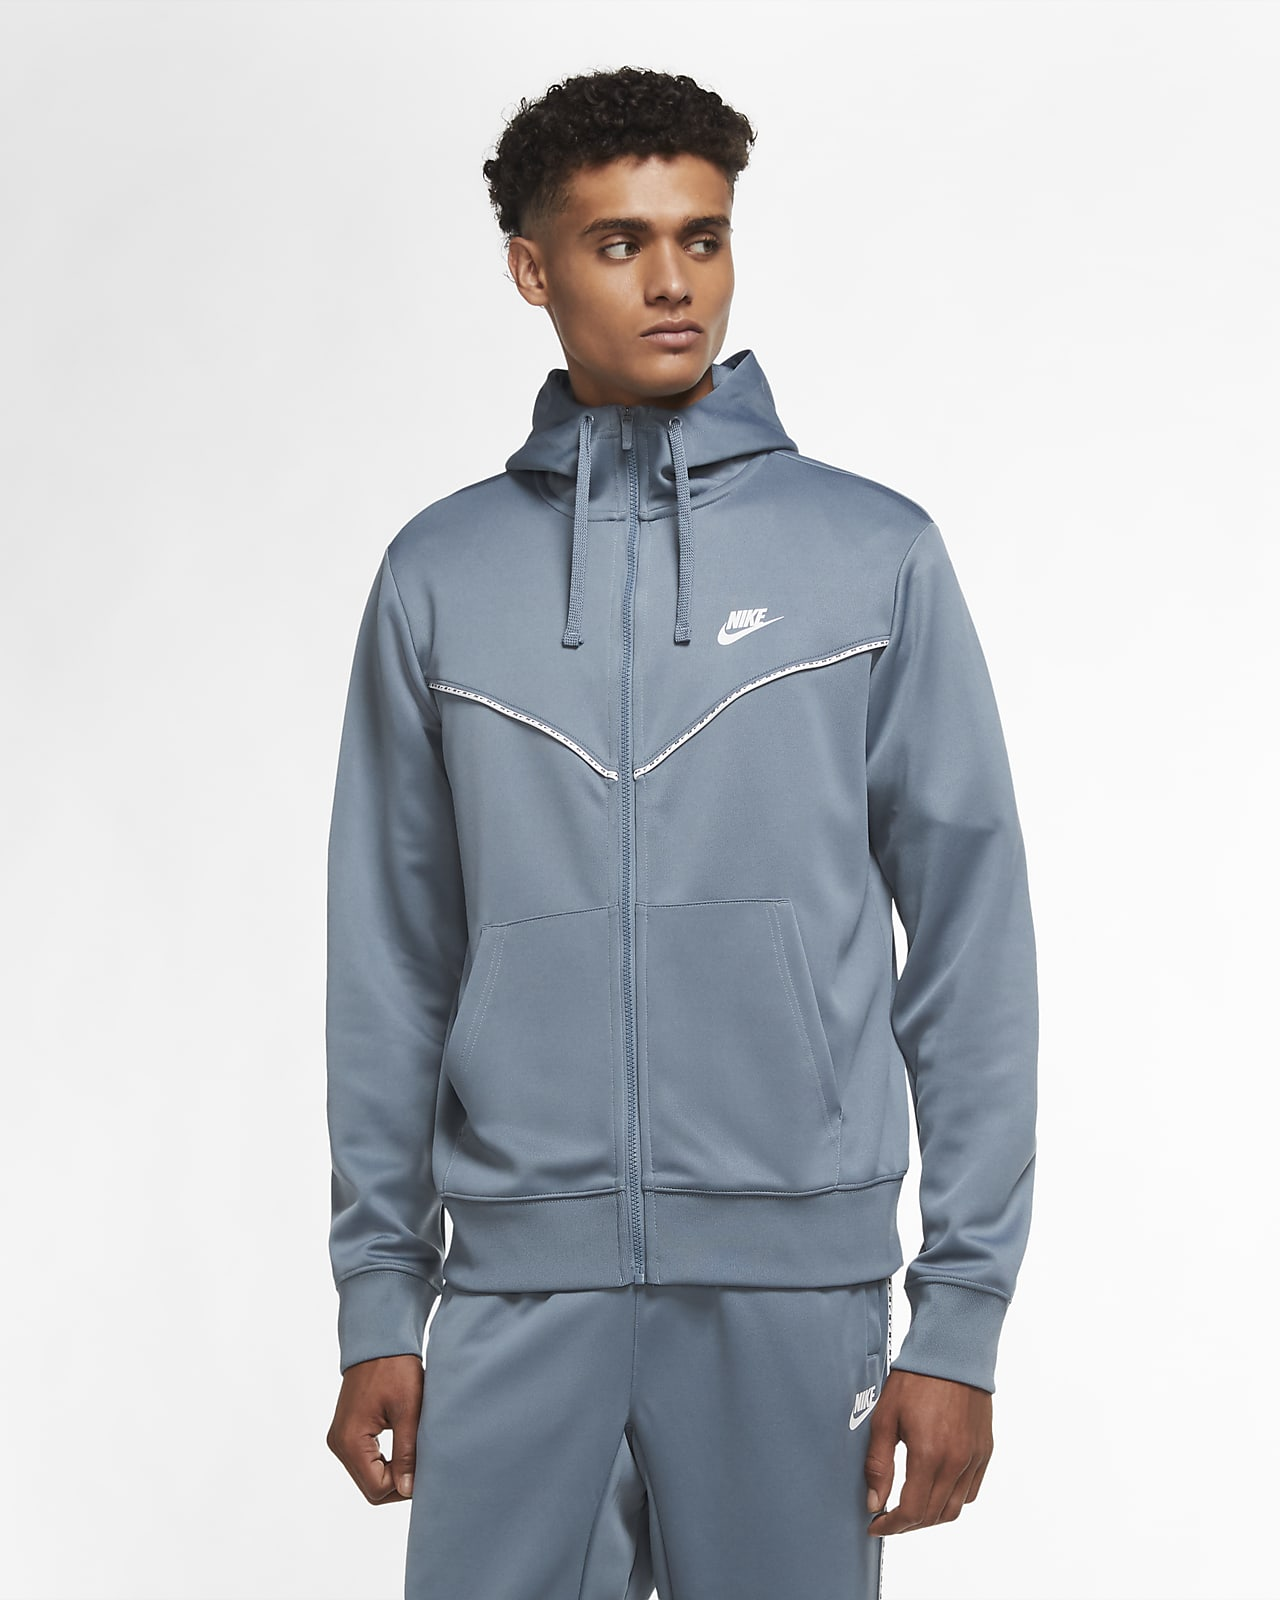 Herre Jakker og vester. Nike NO